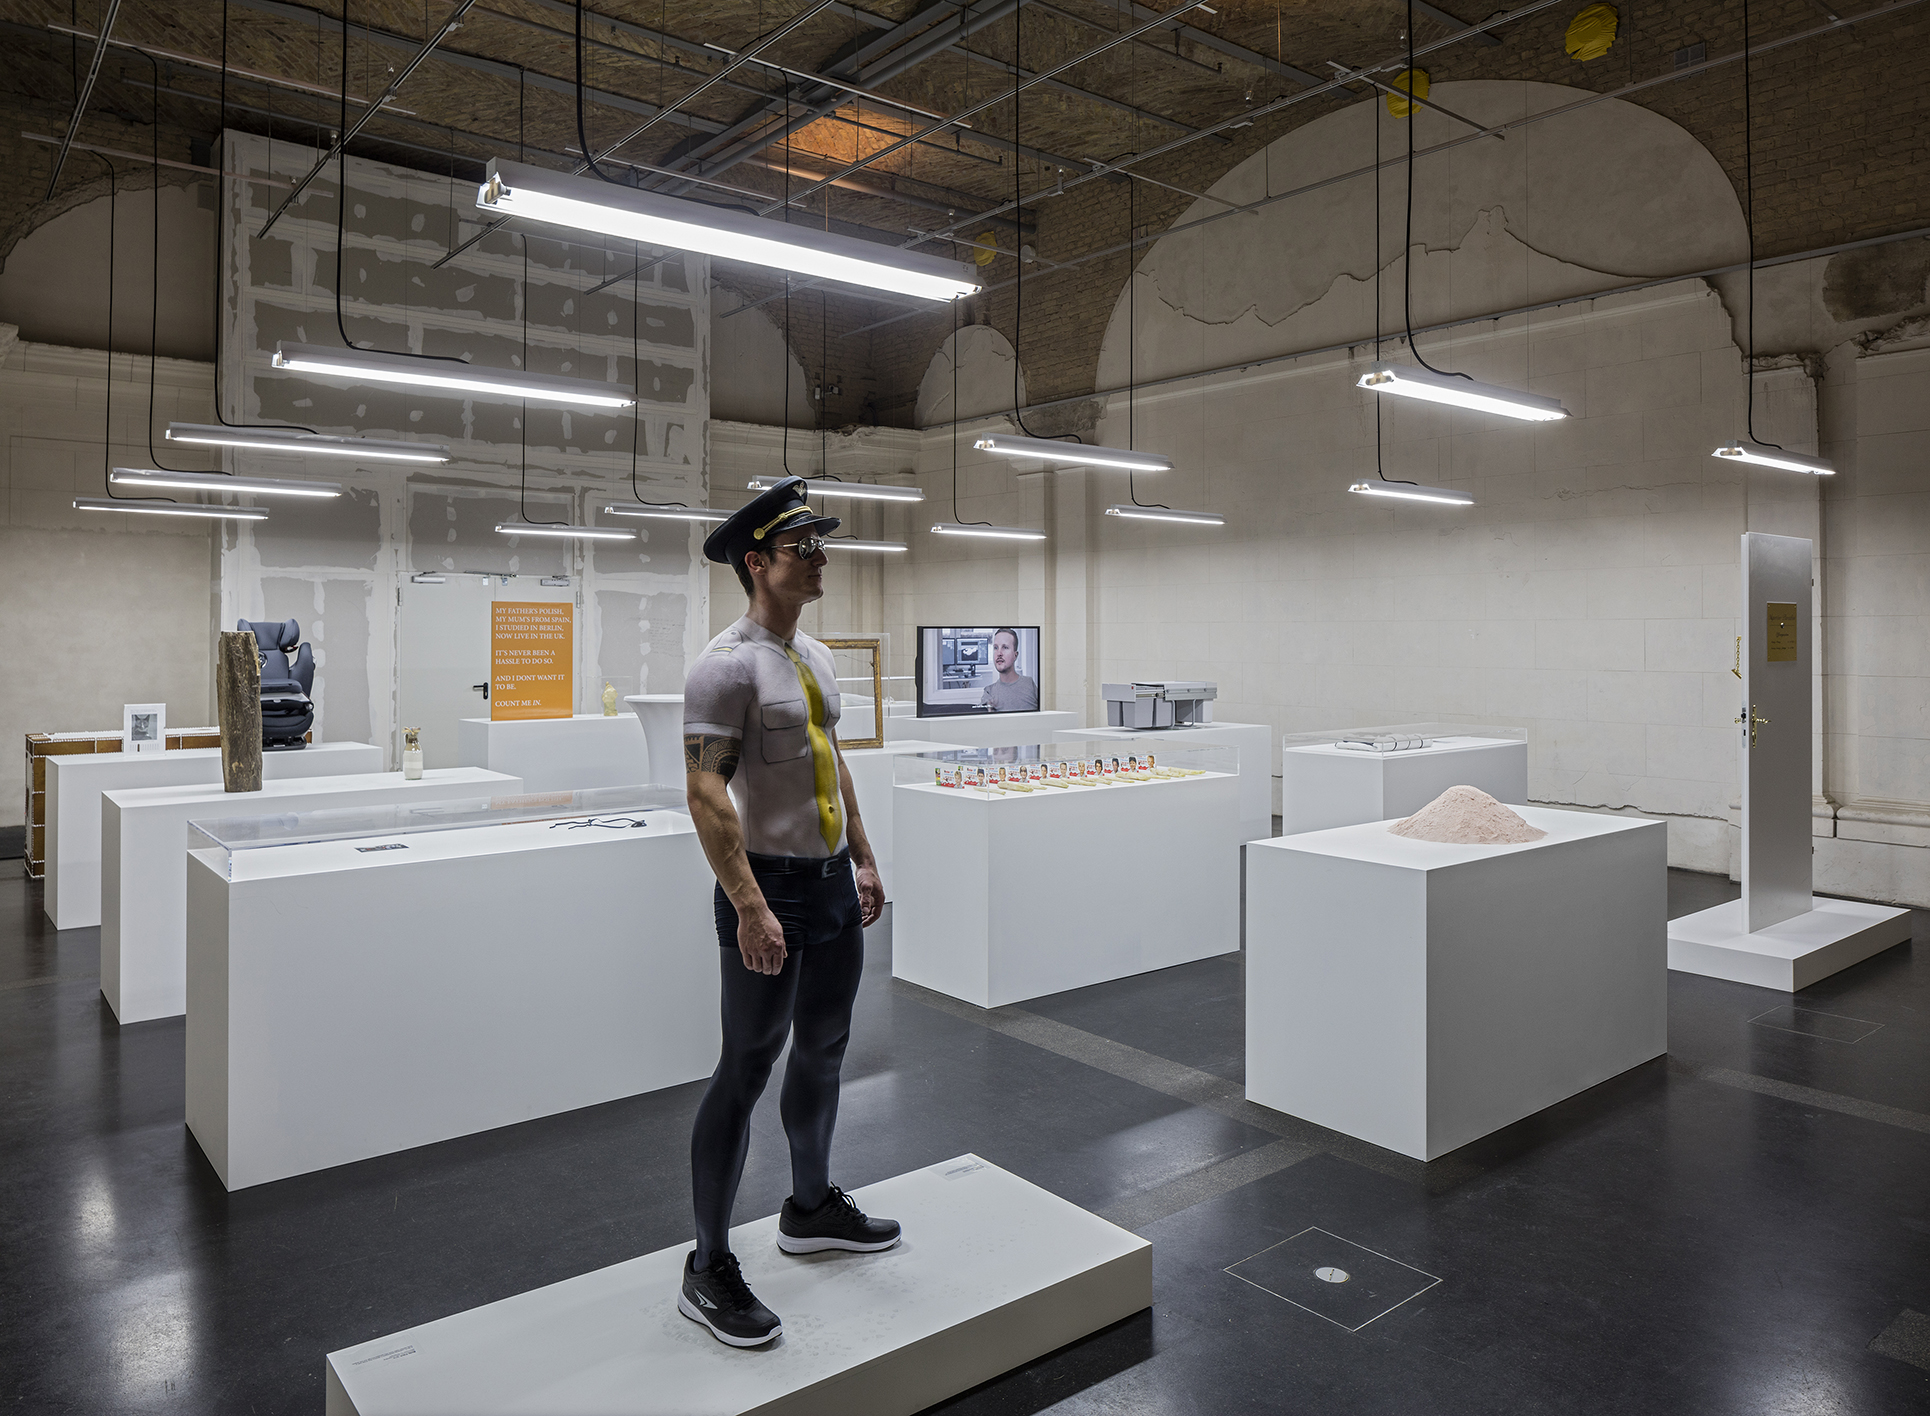 Simon Fujiwara, Installation view, The Happy Museum, 2016, Consultation Daniel Fujiwara, Mixed media, Courtesy Simon Fujiwara (Photo: Timo Ohler)